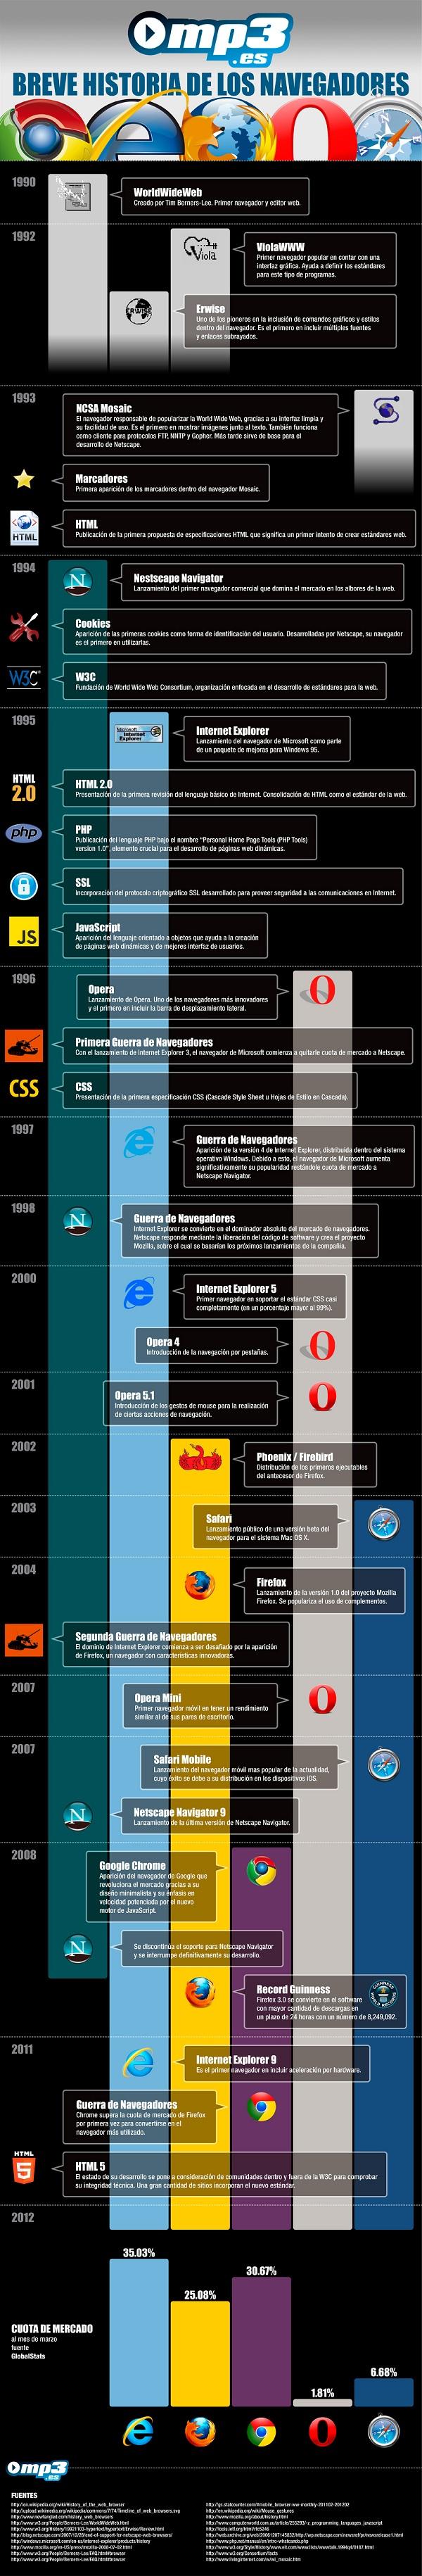 Breve historia de los navegadores #infografia #infographic#internet